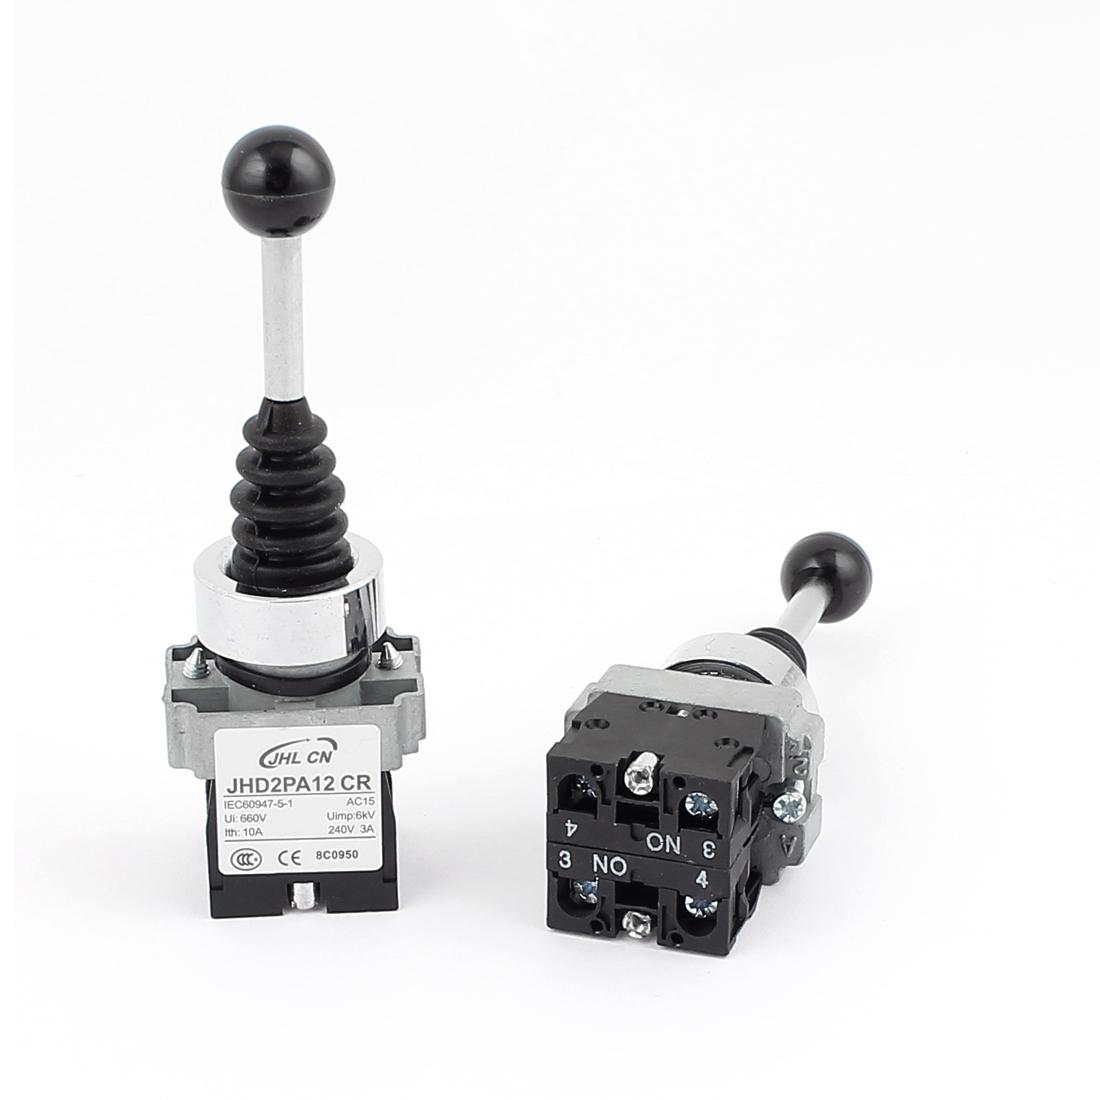 2PCS DPST 2NO Straight 2 Directions Latching Monolever Joystick Switch AC 600V